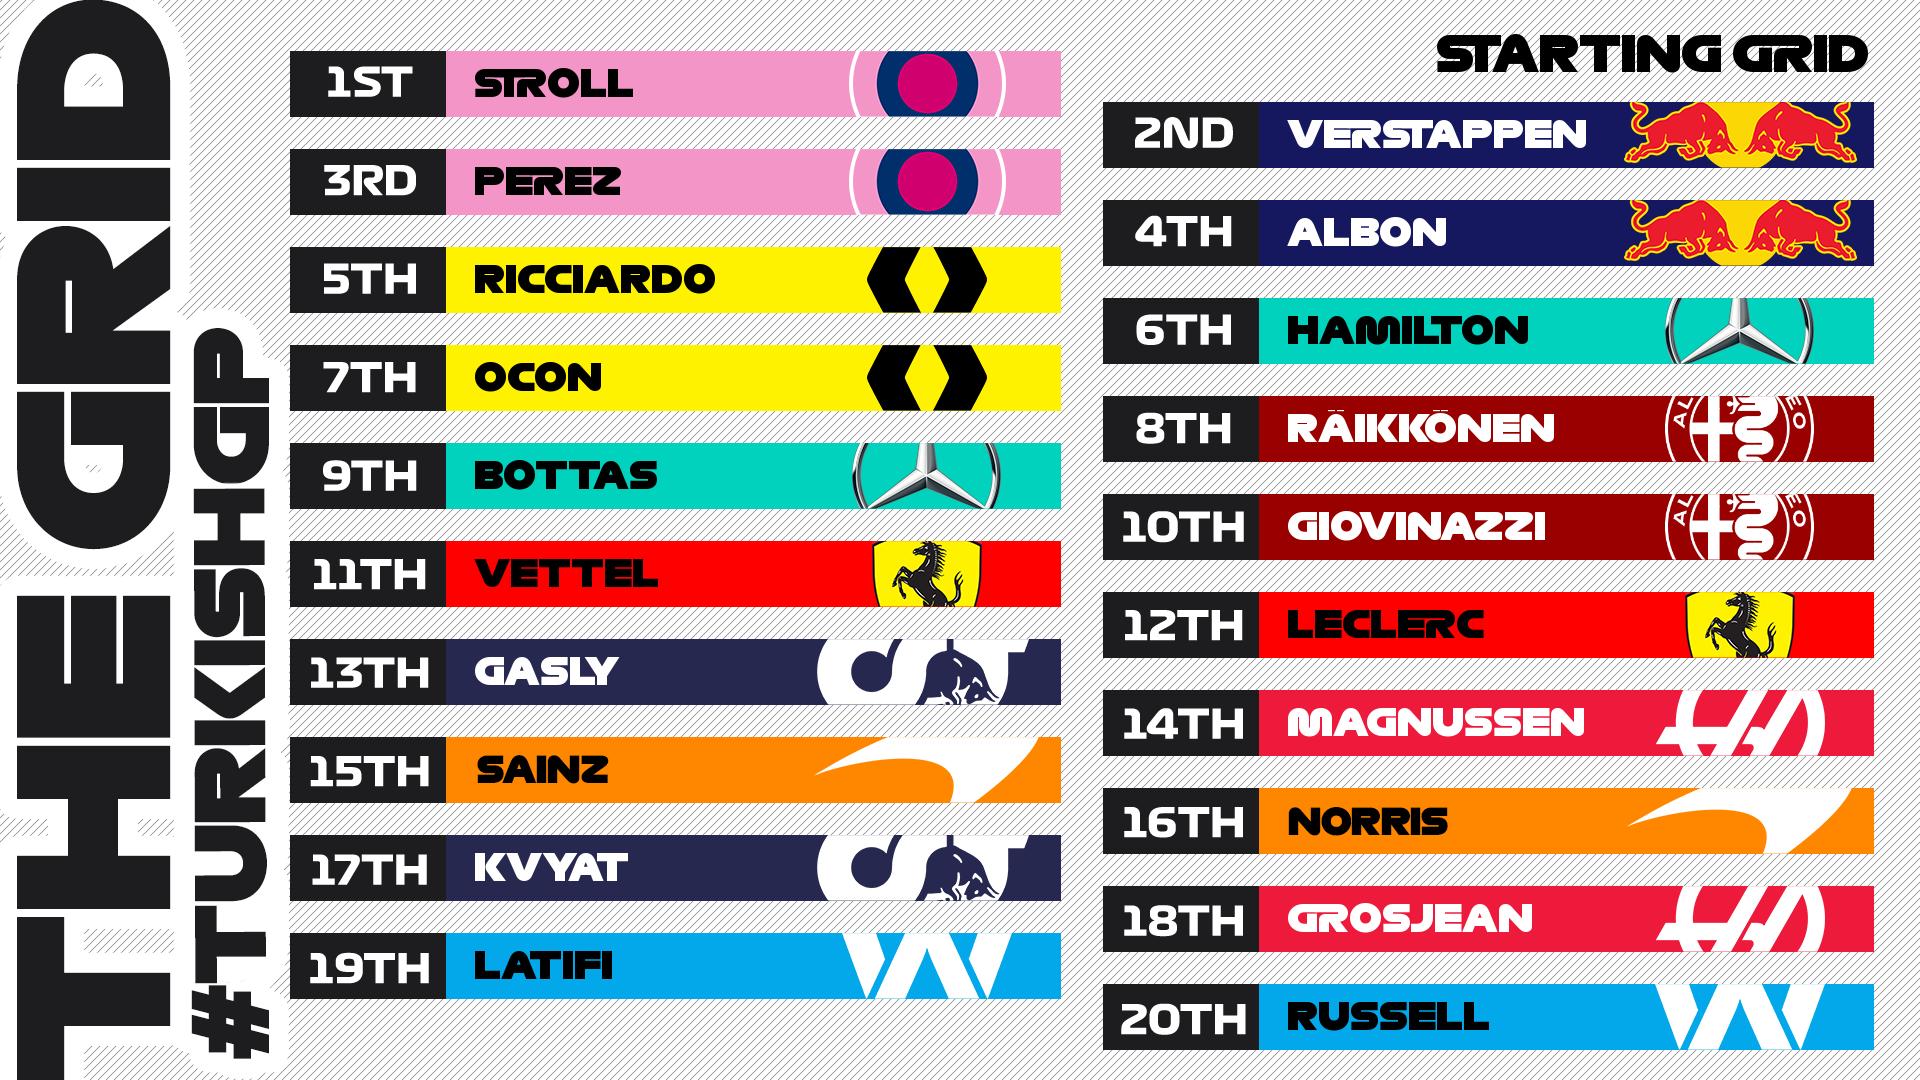 F1 Turkish GP 2020 Live Stream, Schedule & Live Telecast Information of Turkish Grand Prix